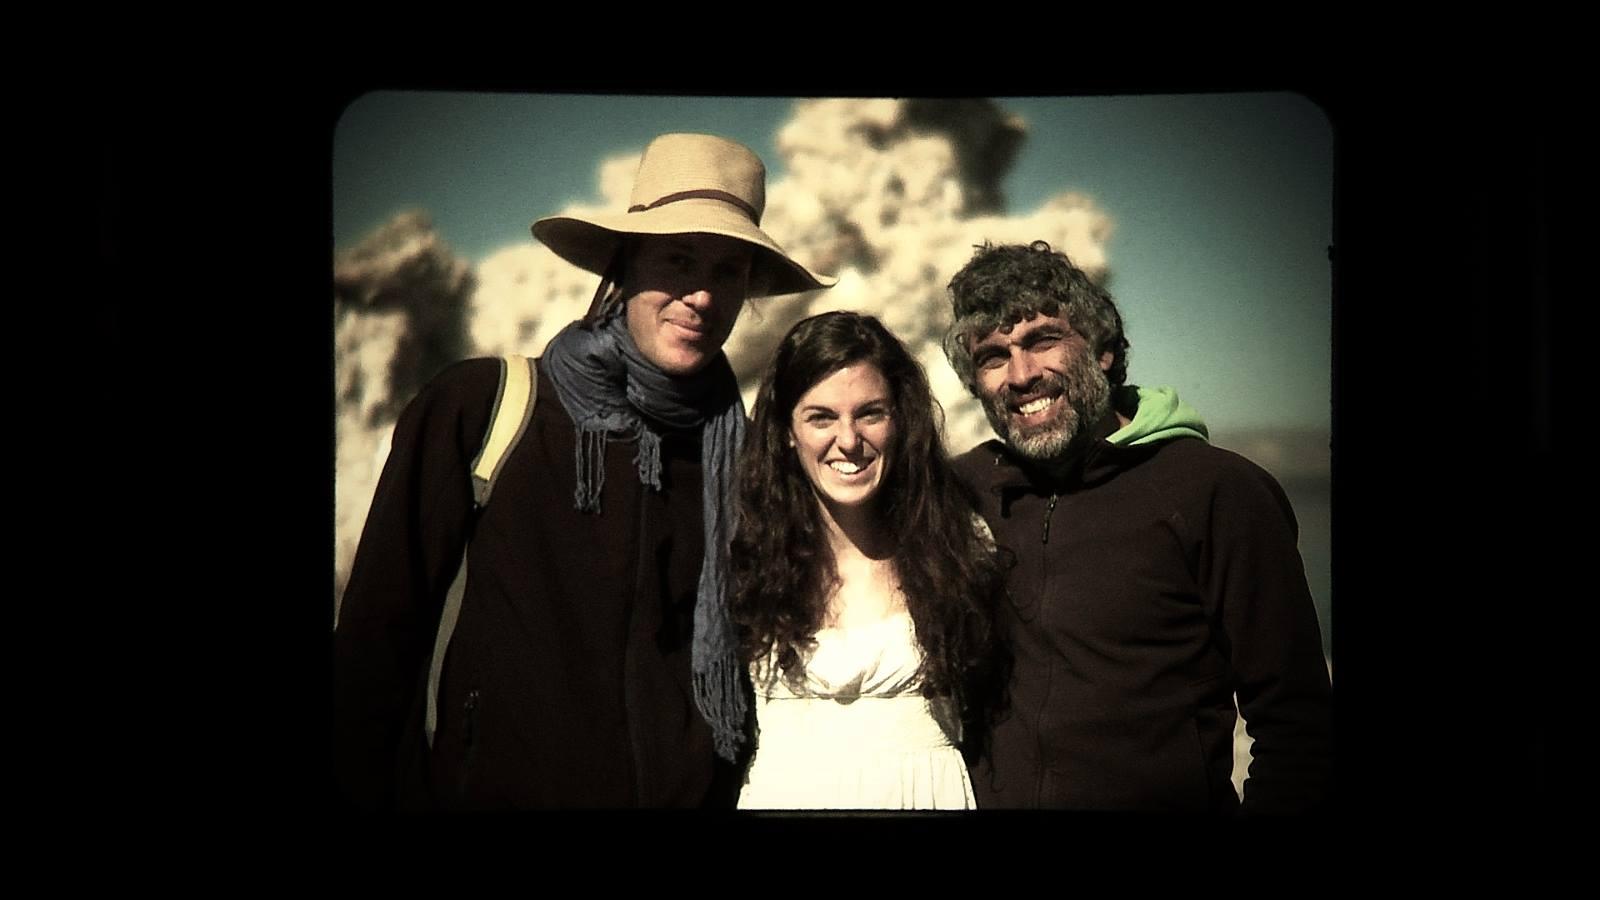 Crew — with Mark Dnl, Katie McFadden and Alex Vargas.